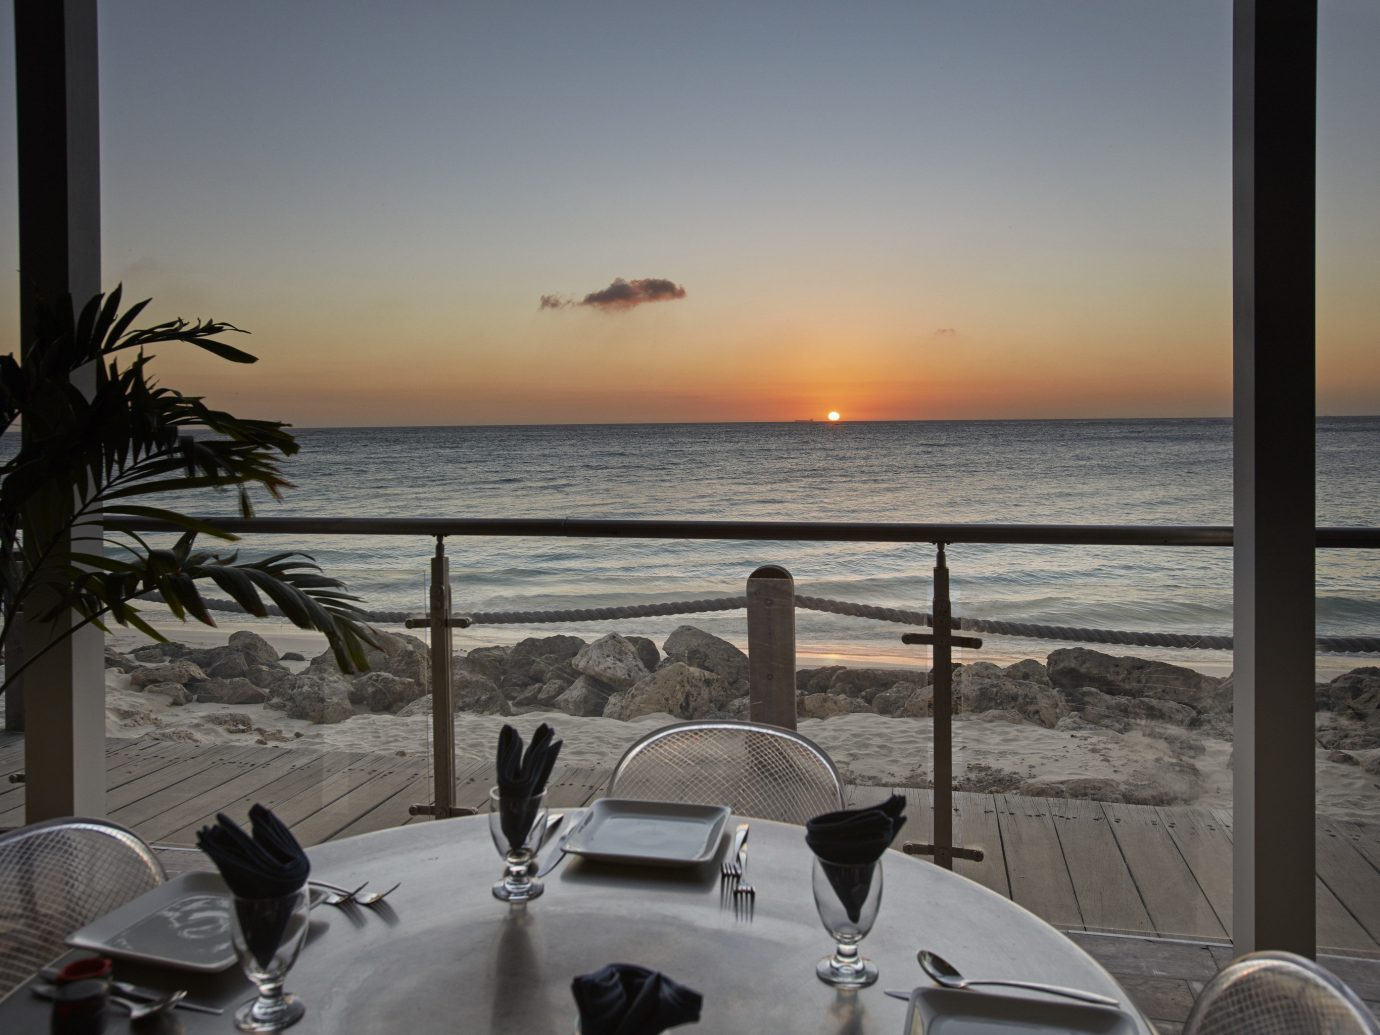 Hotels sky water outdoor Ocean Sea Beach shore vacation Coast morning Sunset evening overlooking